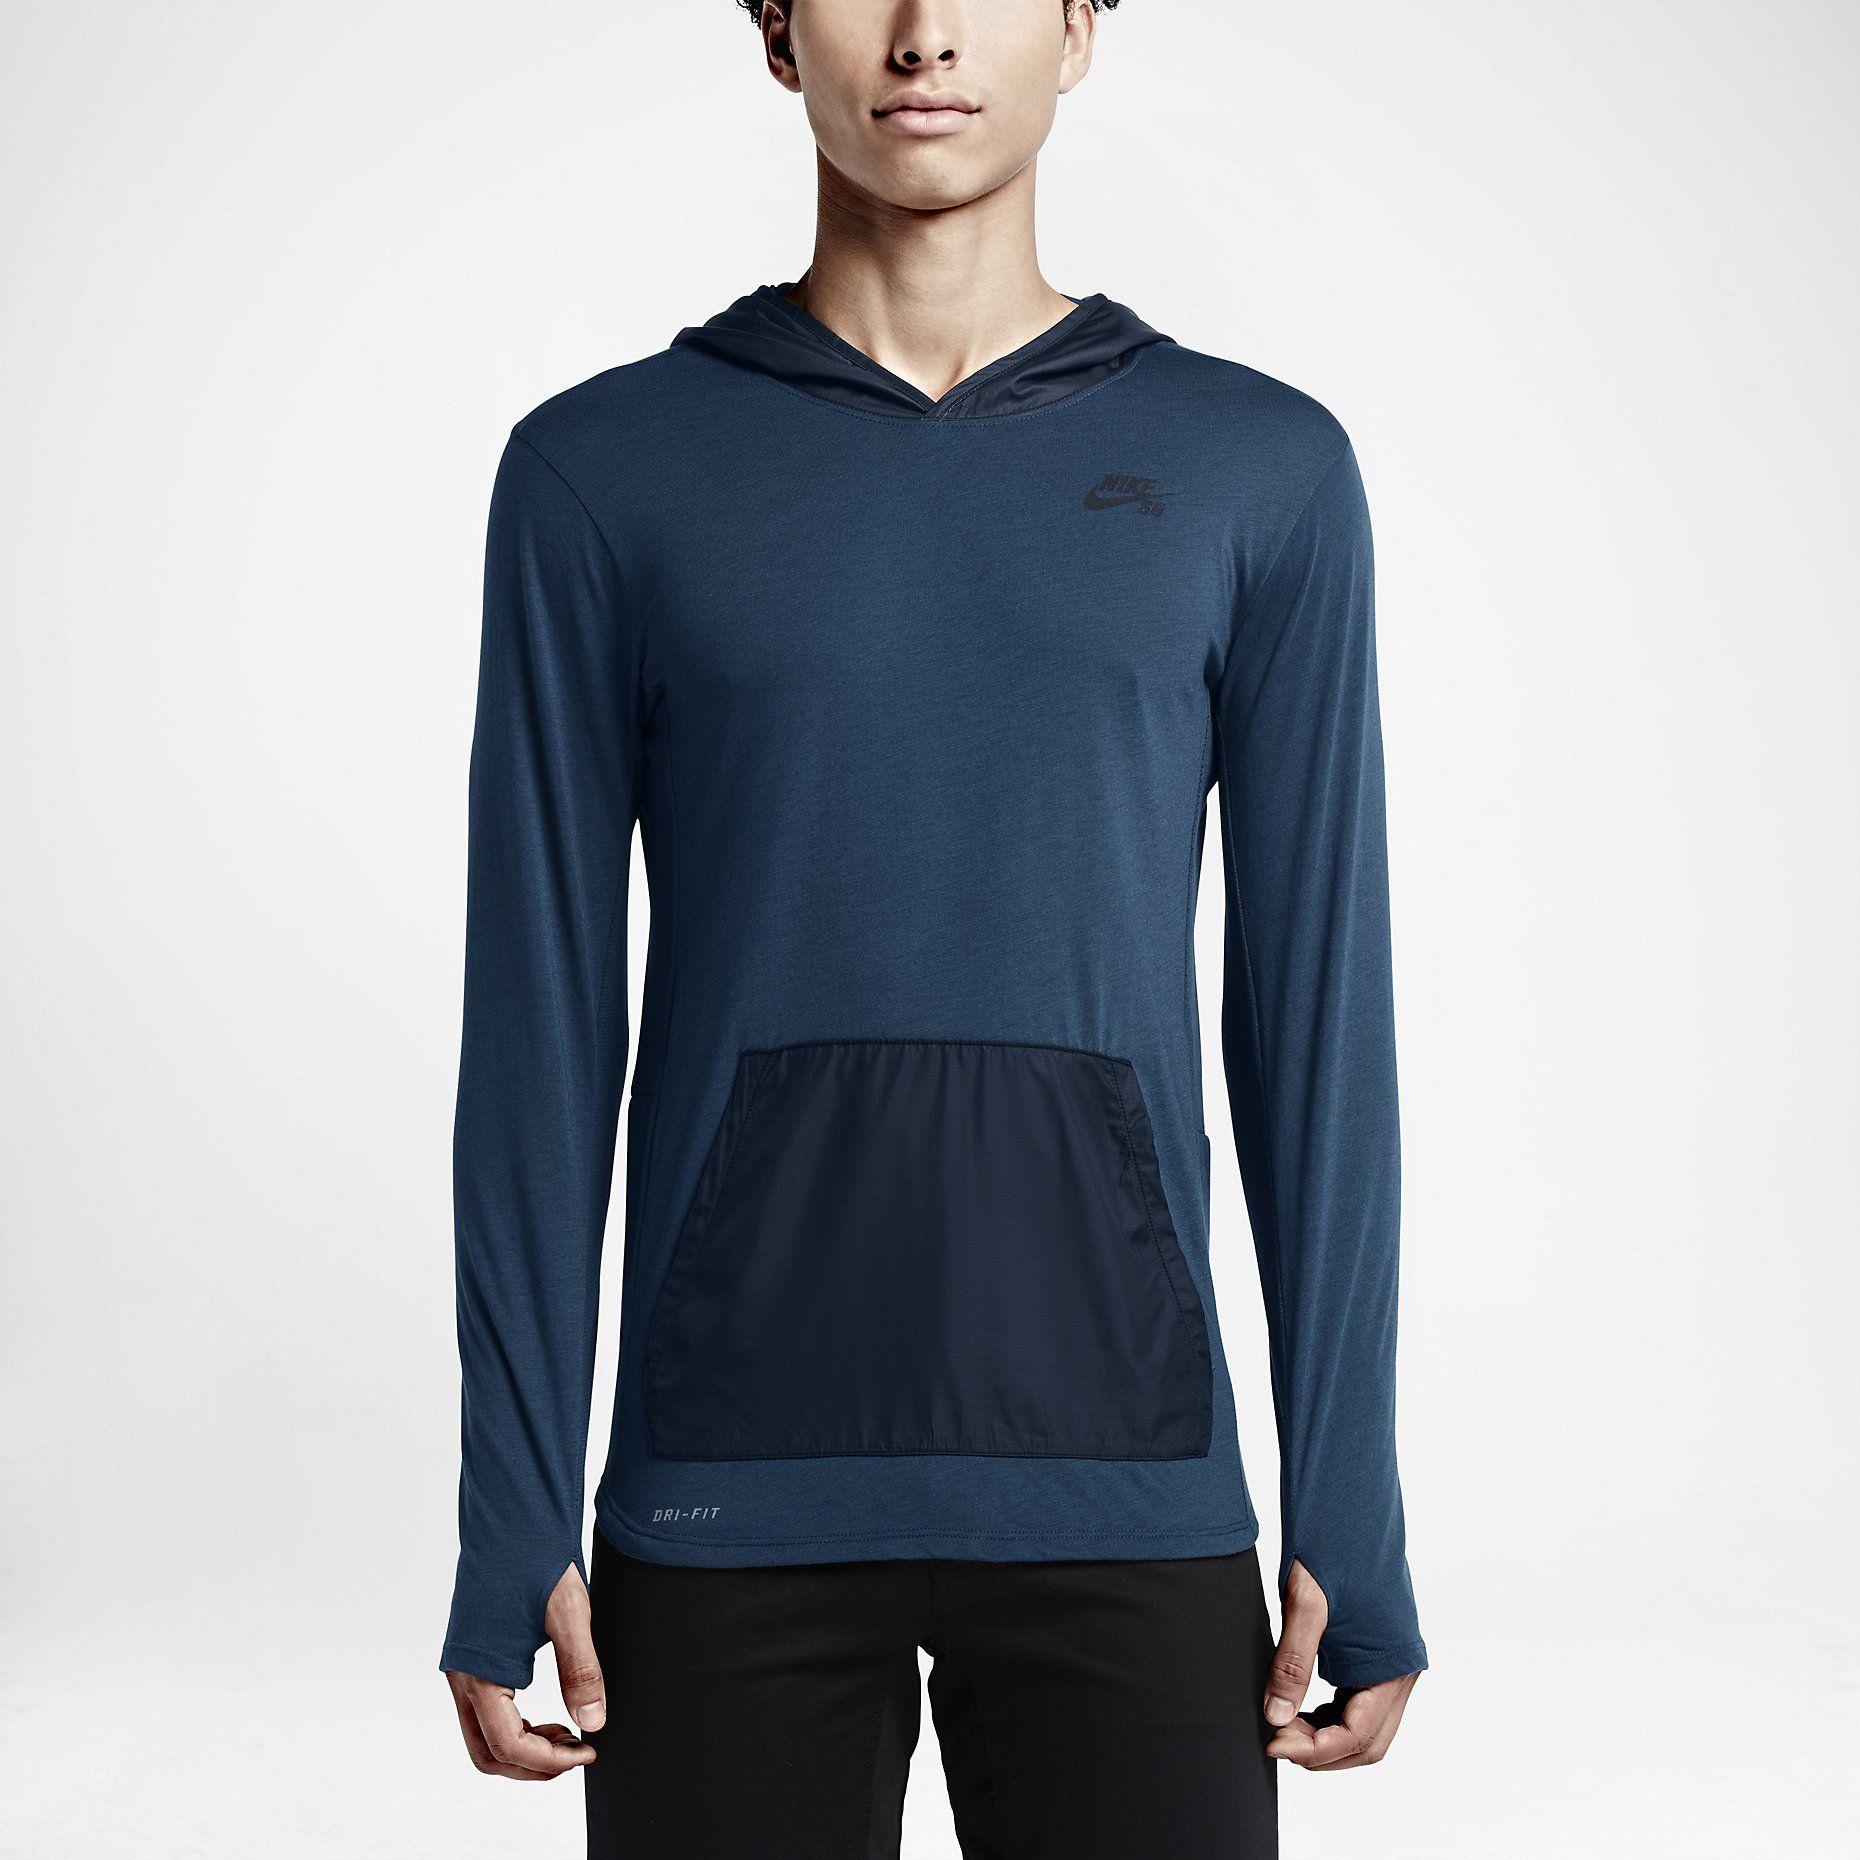 Nike SB Skyline Overlay Pullover Men's Hoodie, Squadron Blue/Dark Obsidian/